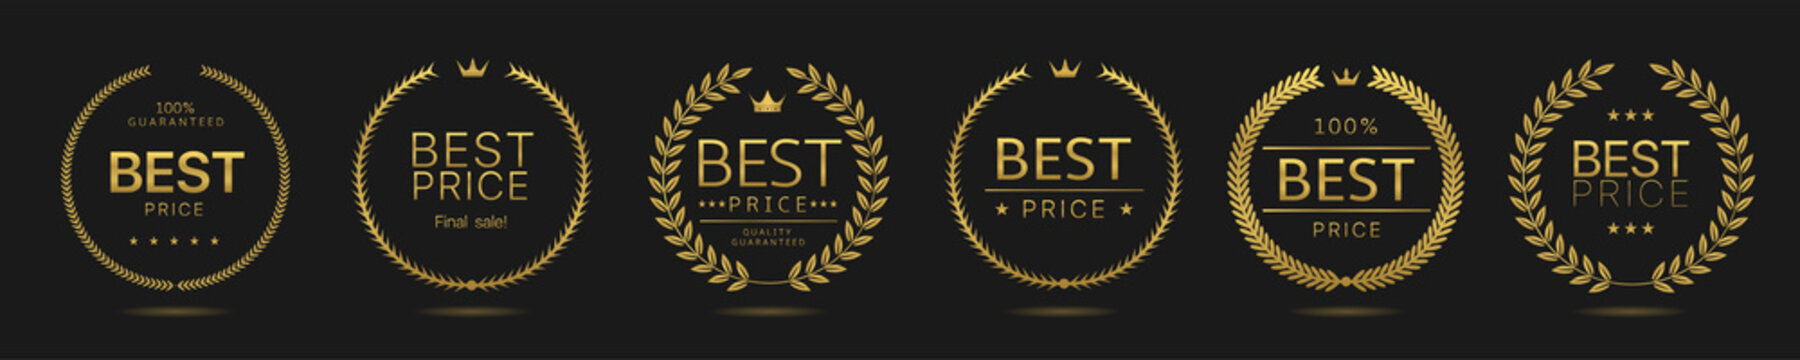 Best price Golden wreath icons